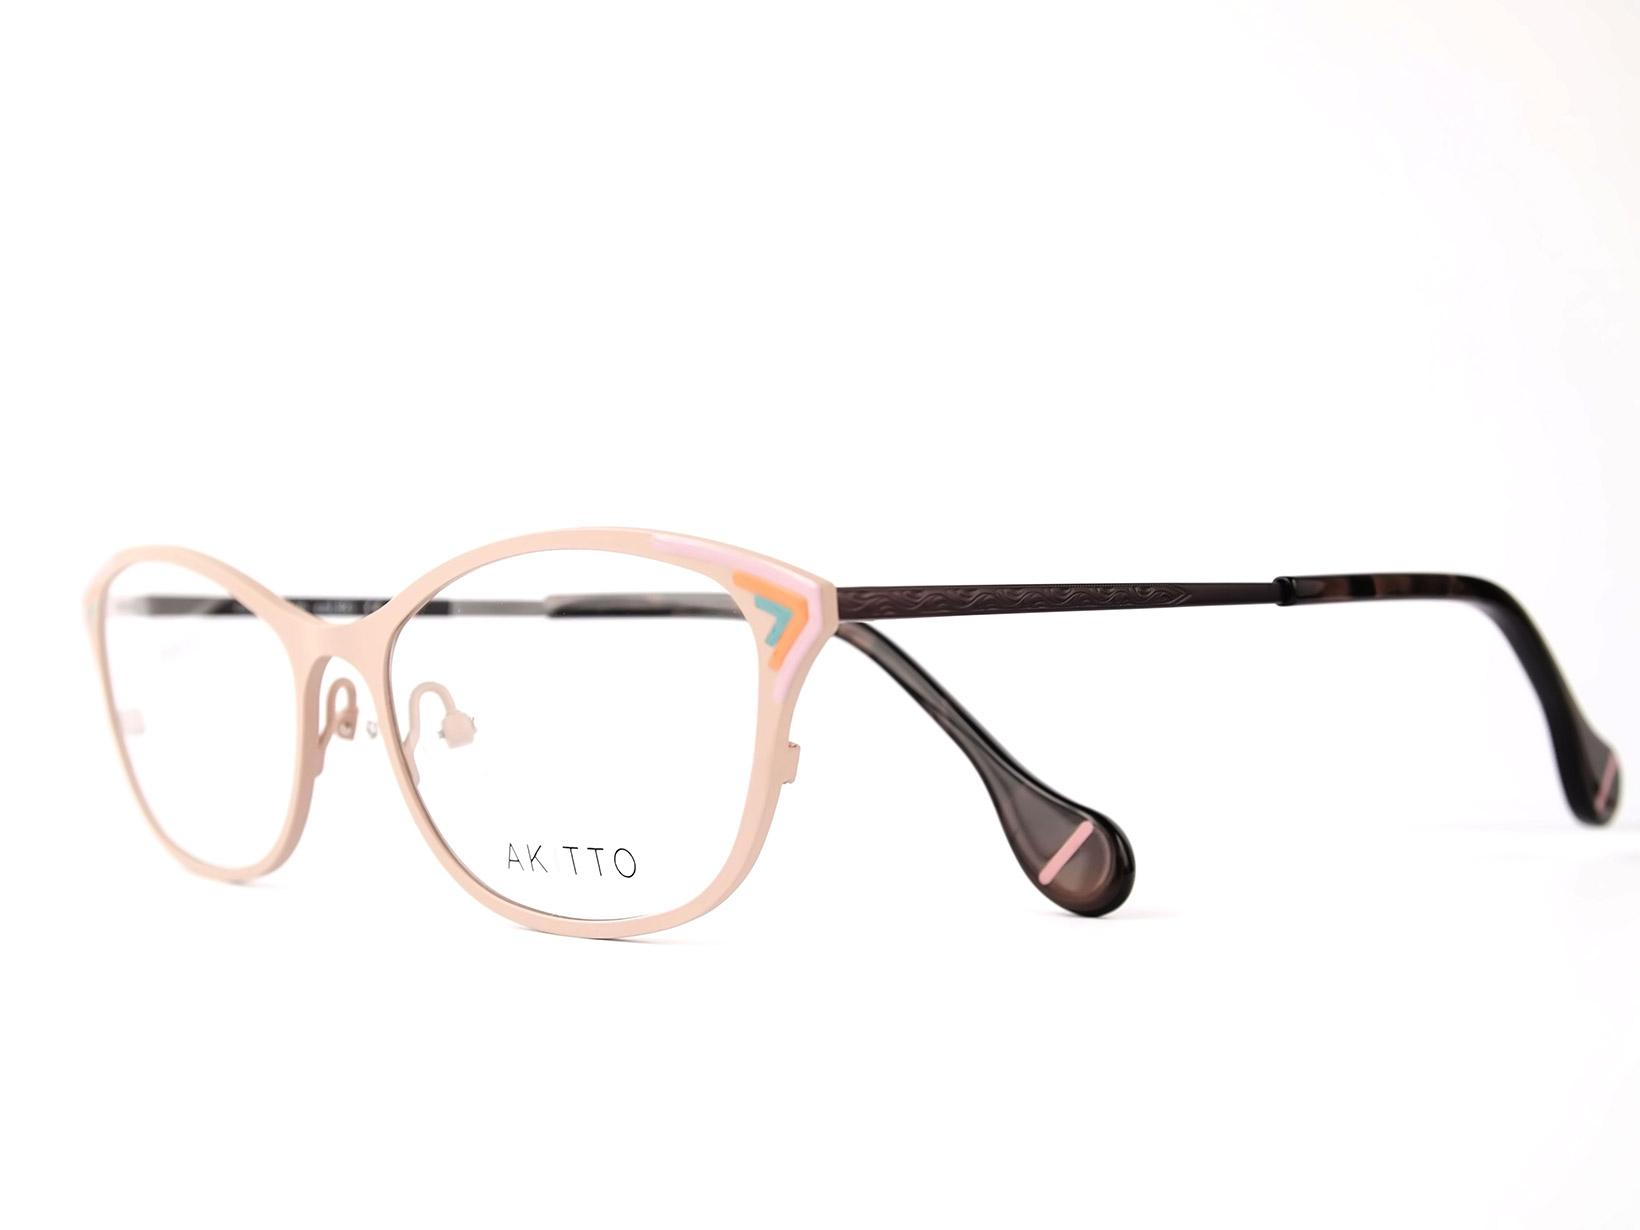 AKITTO 2016-2nd emi color BG size:52□16 material: titanium price:44,500-(+tax)